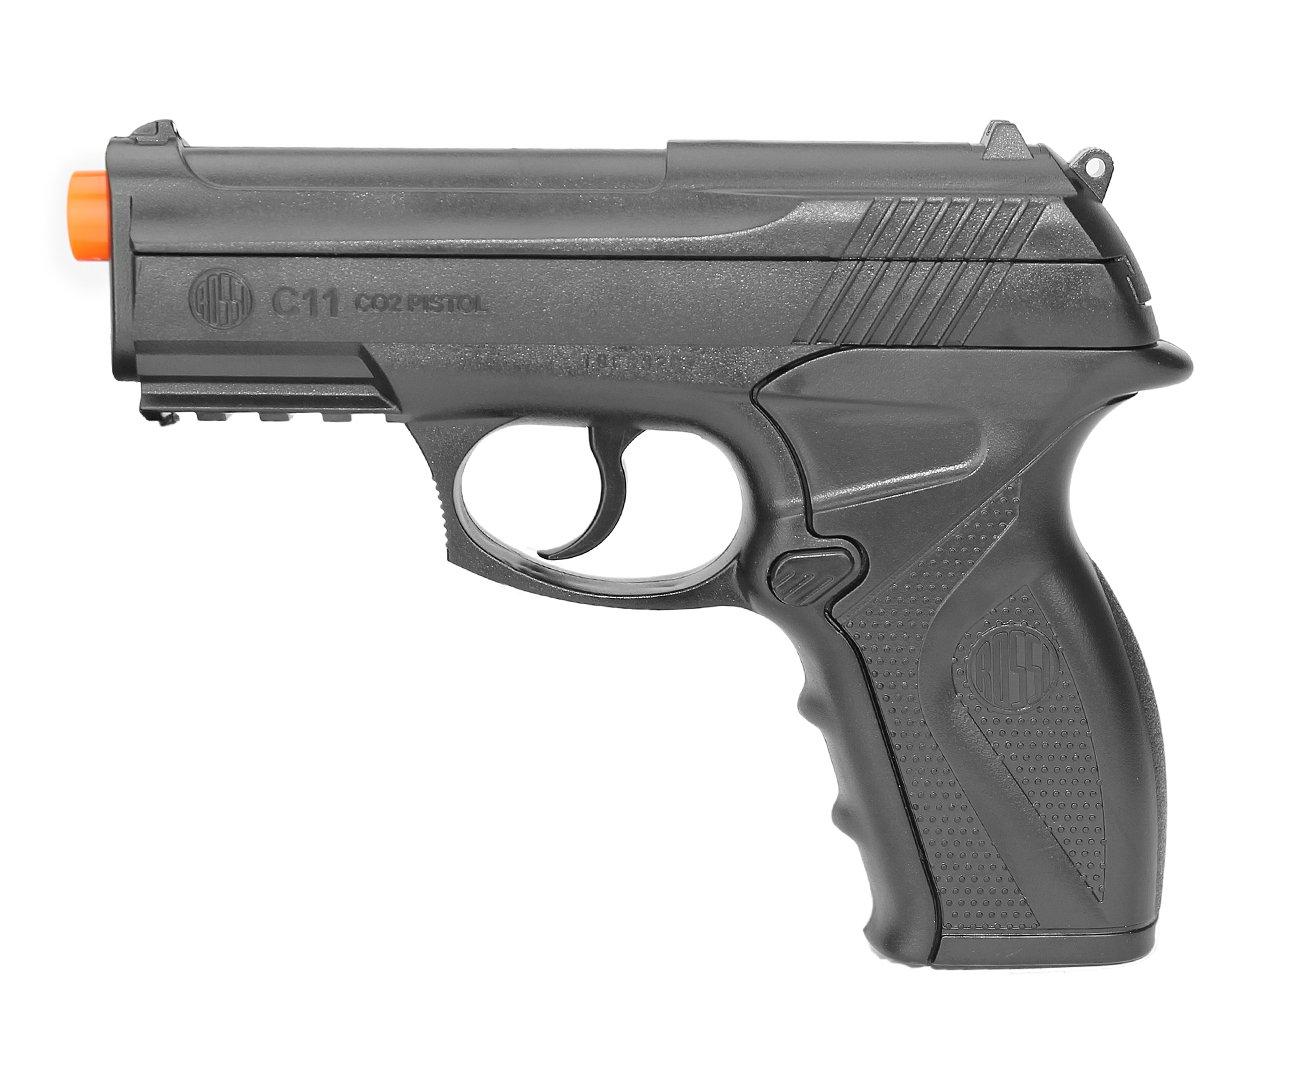 Pistola De Airsoft Gas Co2 Wg C11 6,0mm - Win Gun